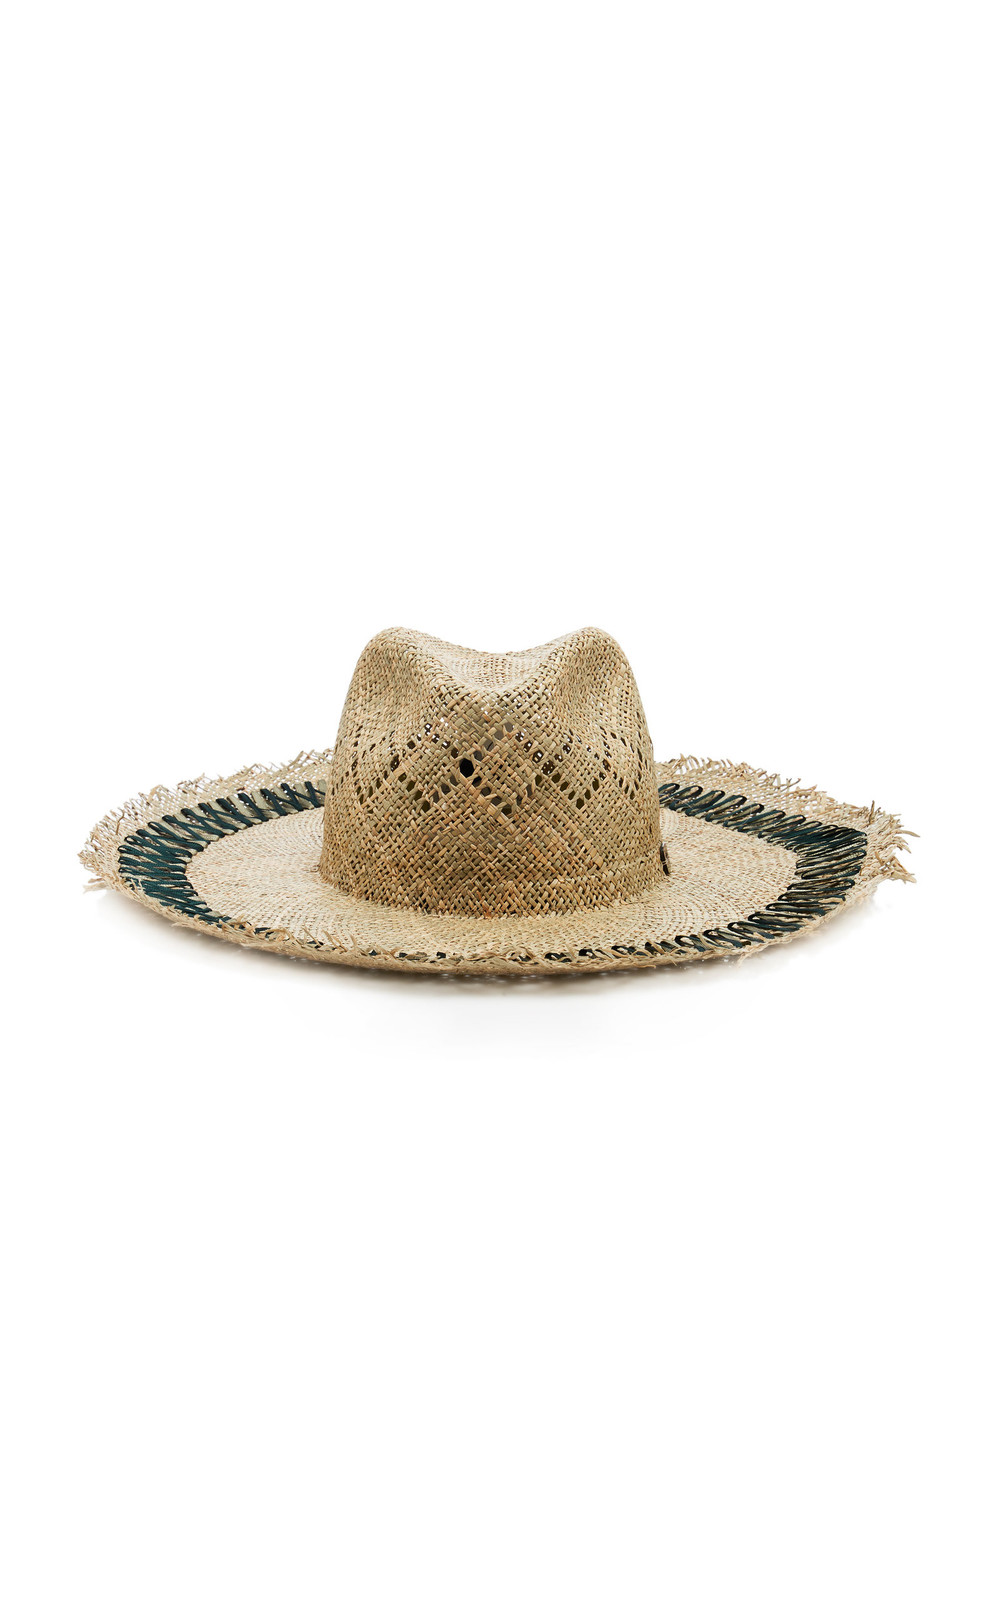 Filu Hats Capri Forest Straw Hat in green